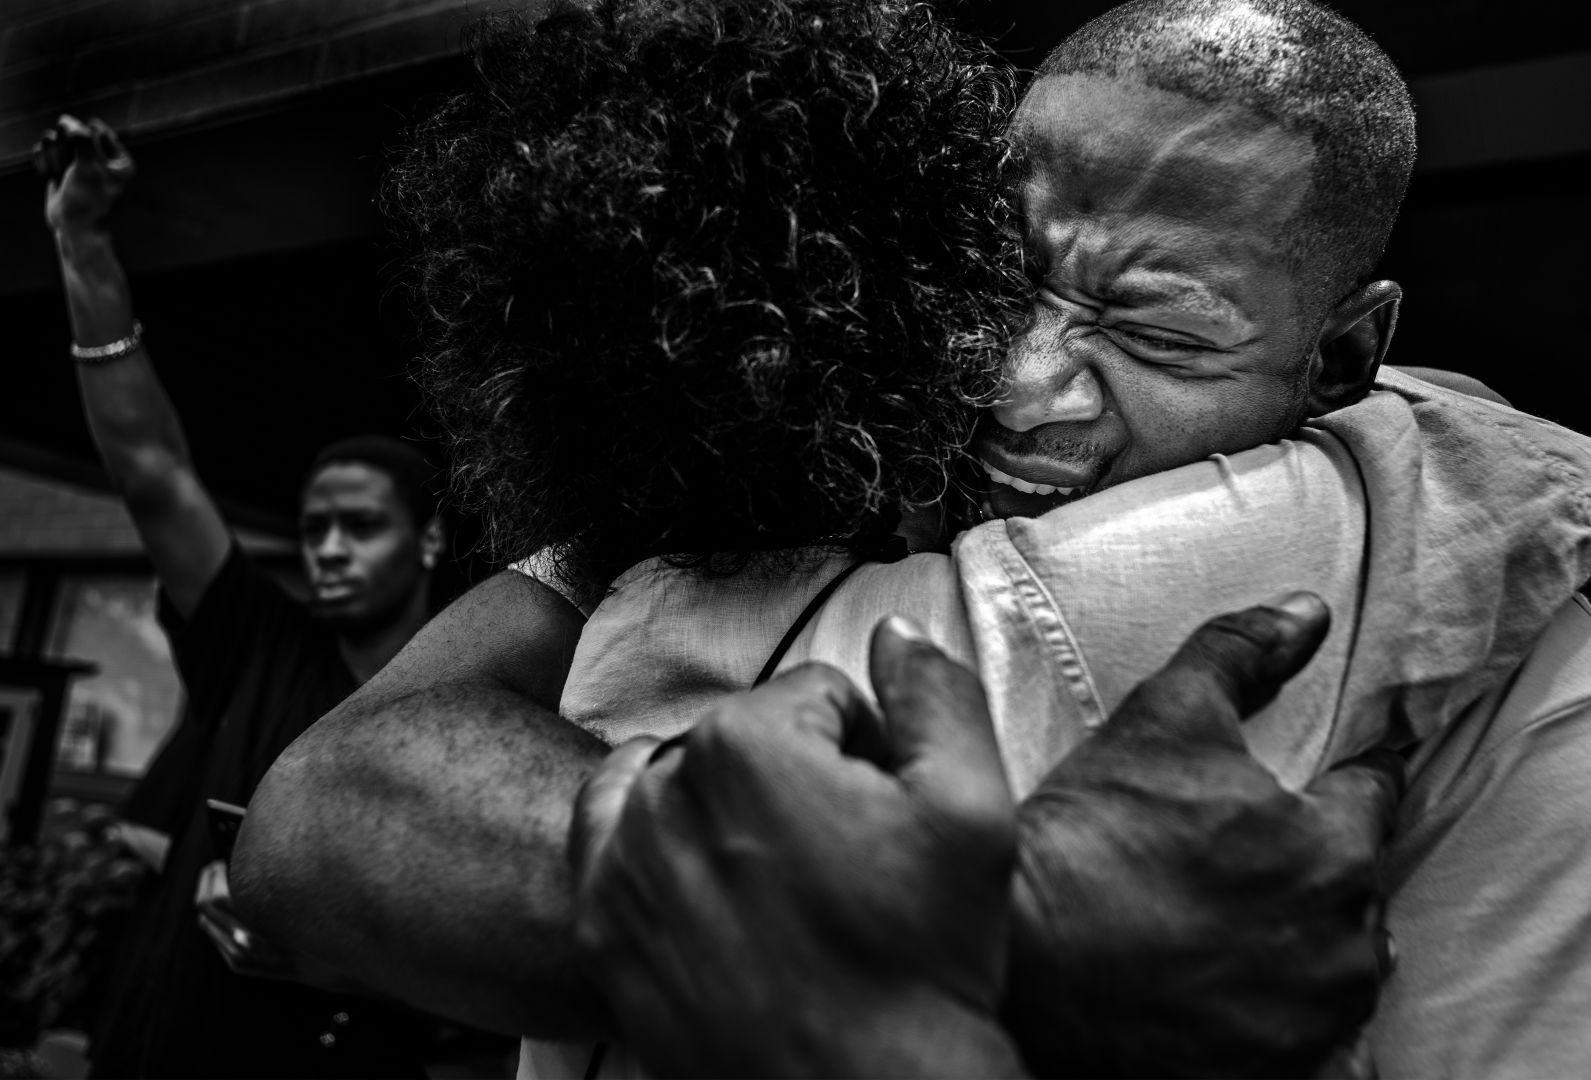 Не мой вердикт, © Ричард Цонг-Таатари, США, 2-й приз : одиночный кадр, Фотоконкурс World Press Photo